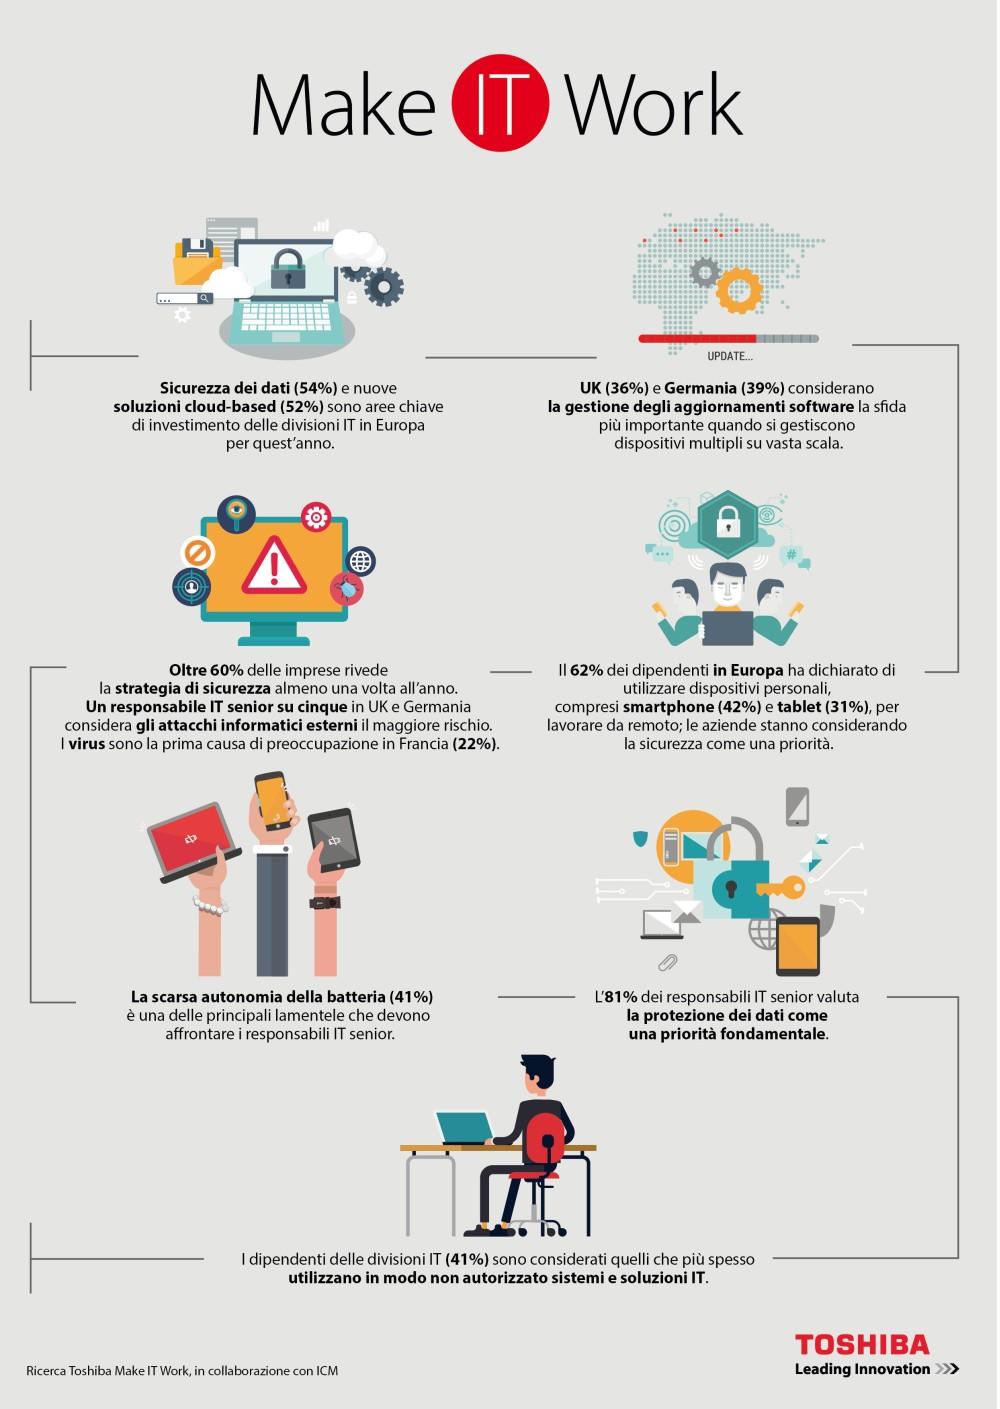 Toshiba_Make IT Work_infografica